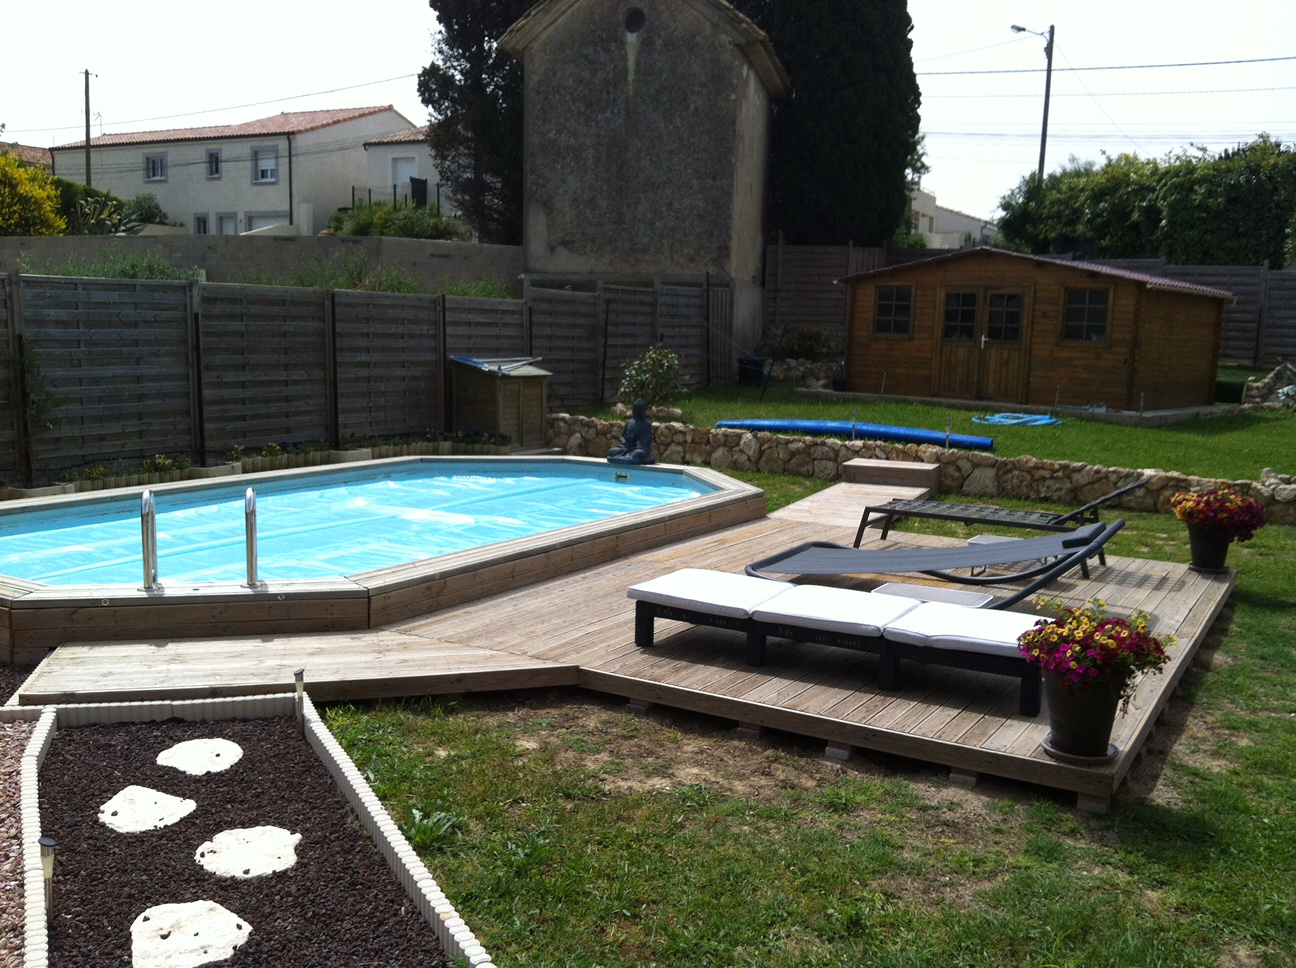 Piscine Tubulaire Terrasse Bois amenagement piscine bois piscine - idees conception jardin